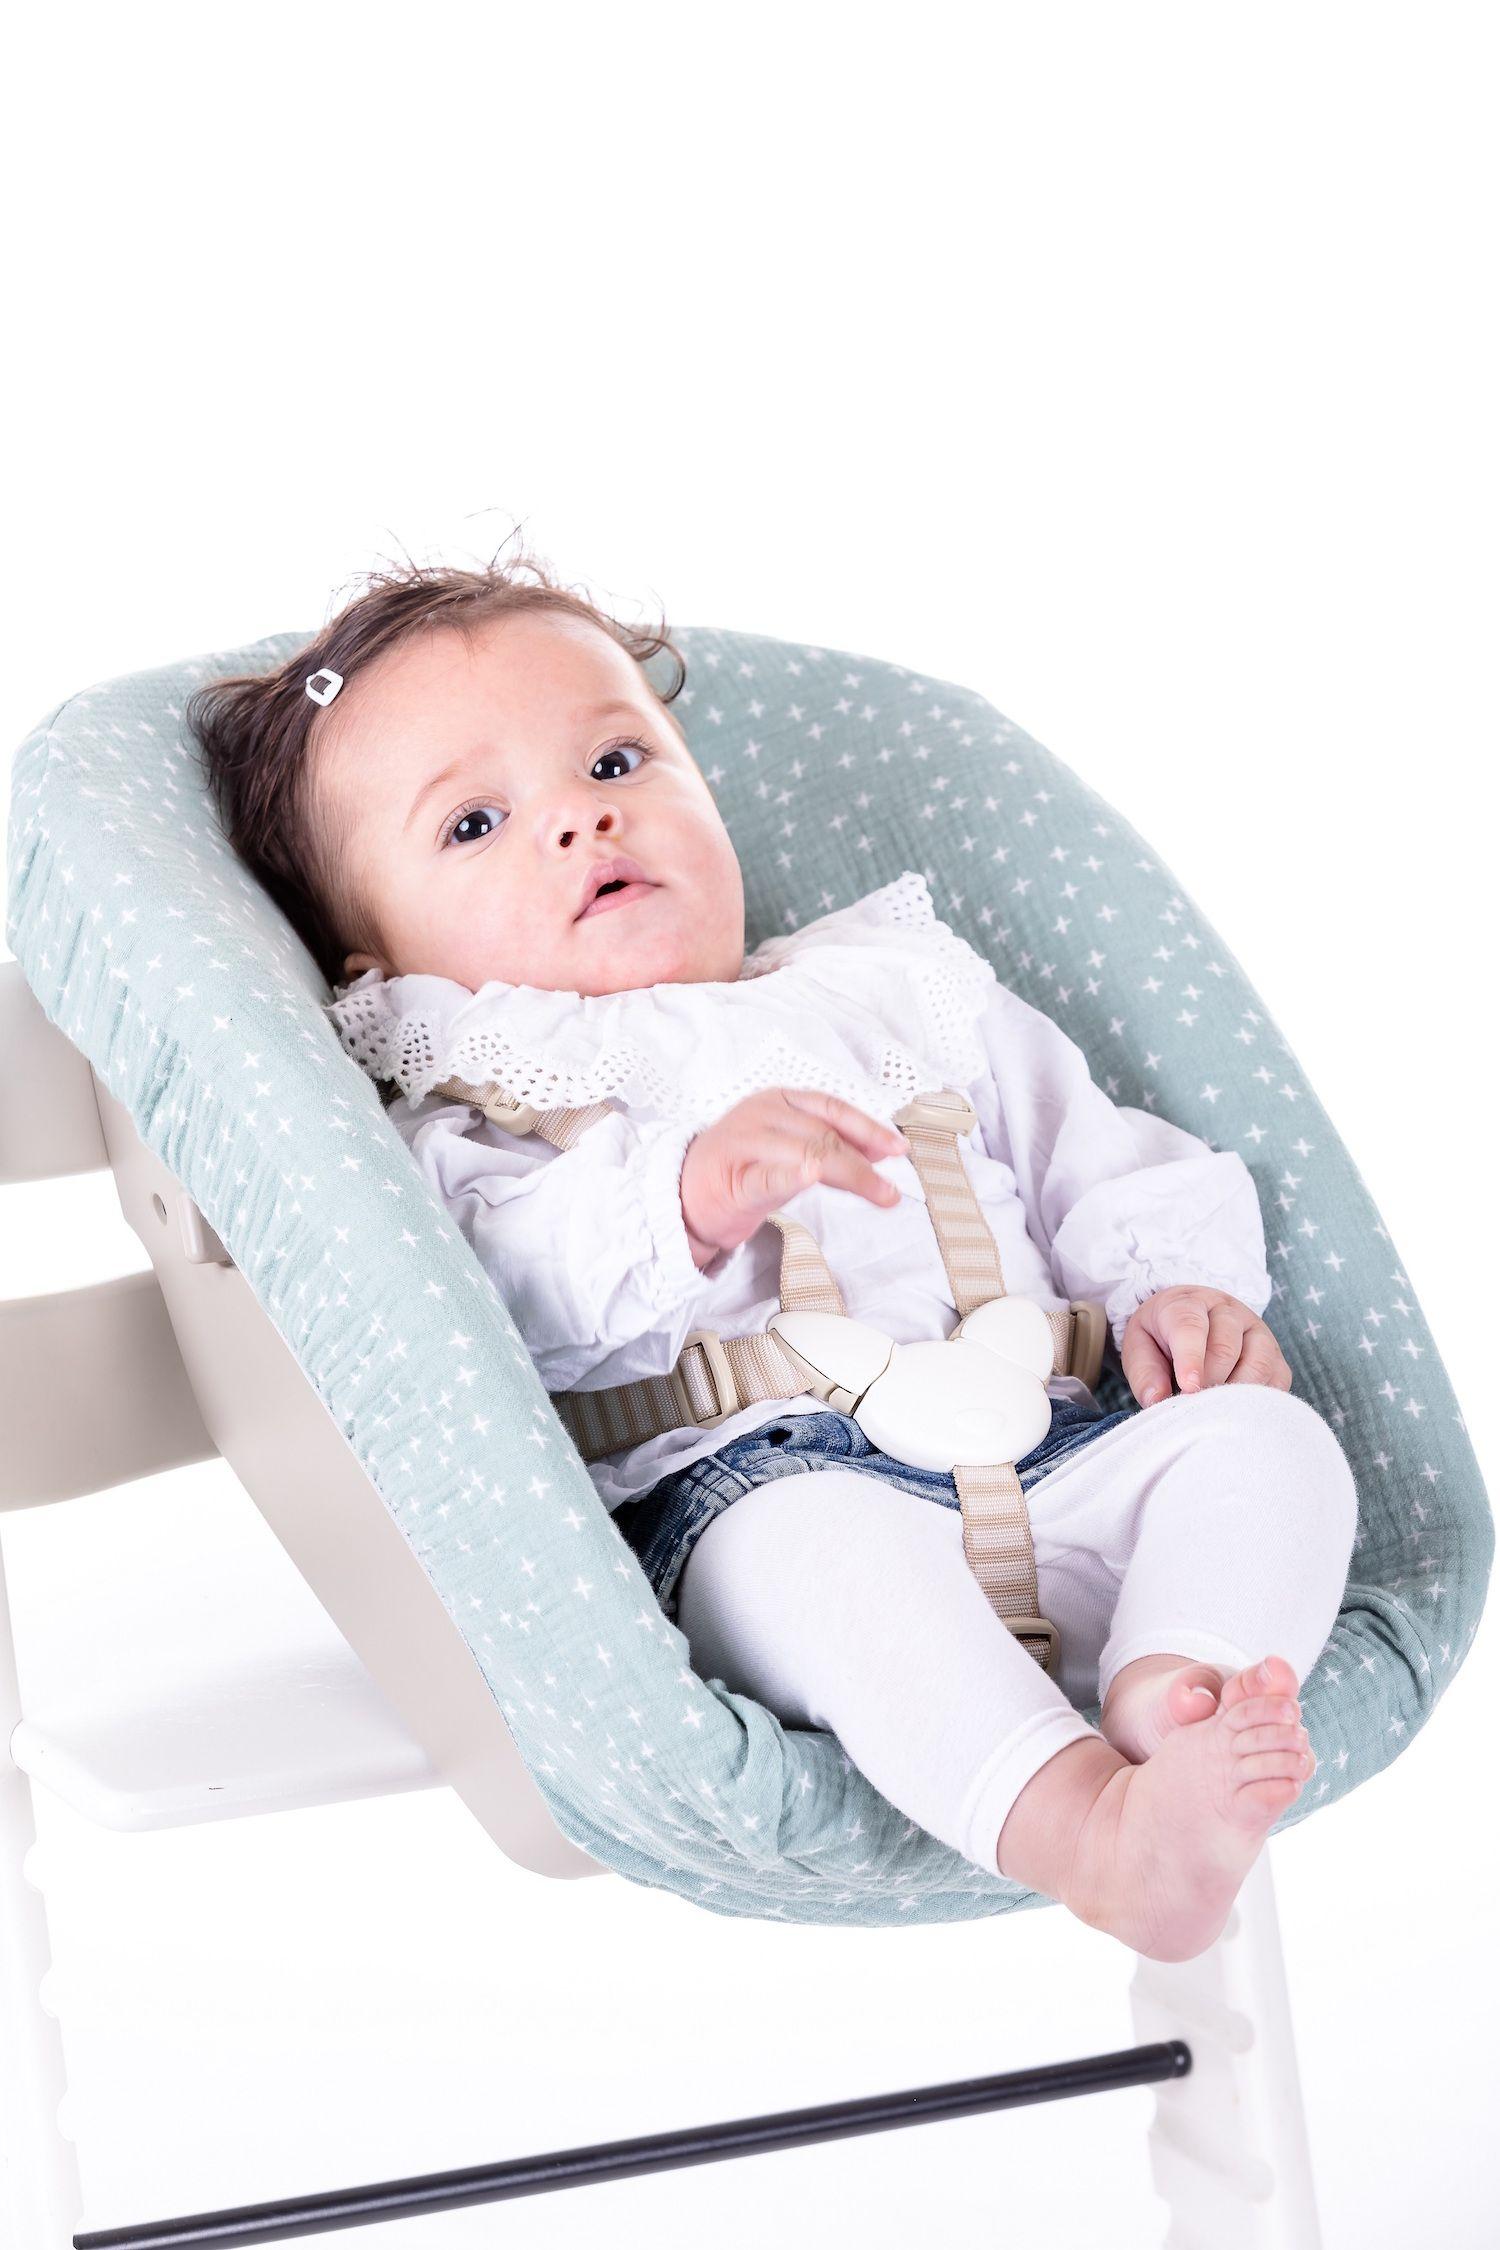 Newborn hoes Zacht mint plusje voor Stokke stoelverkleiner - ukje.nl